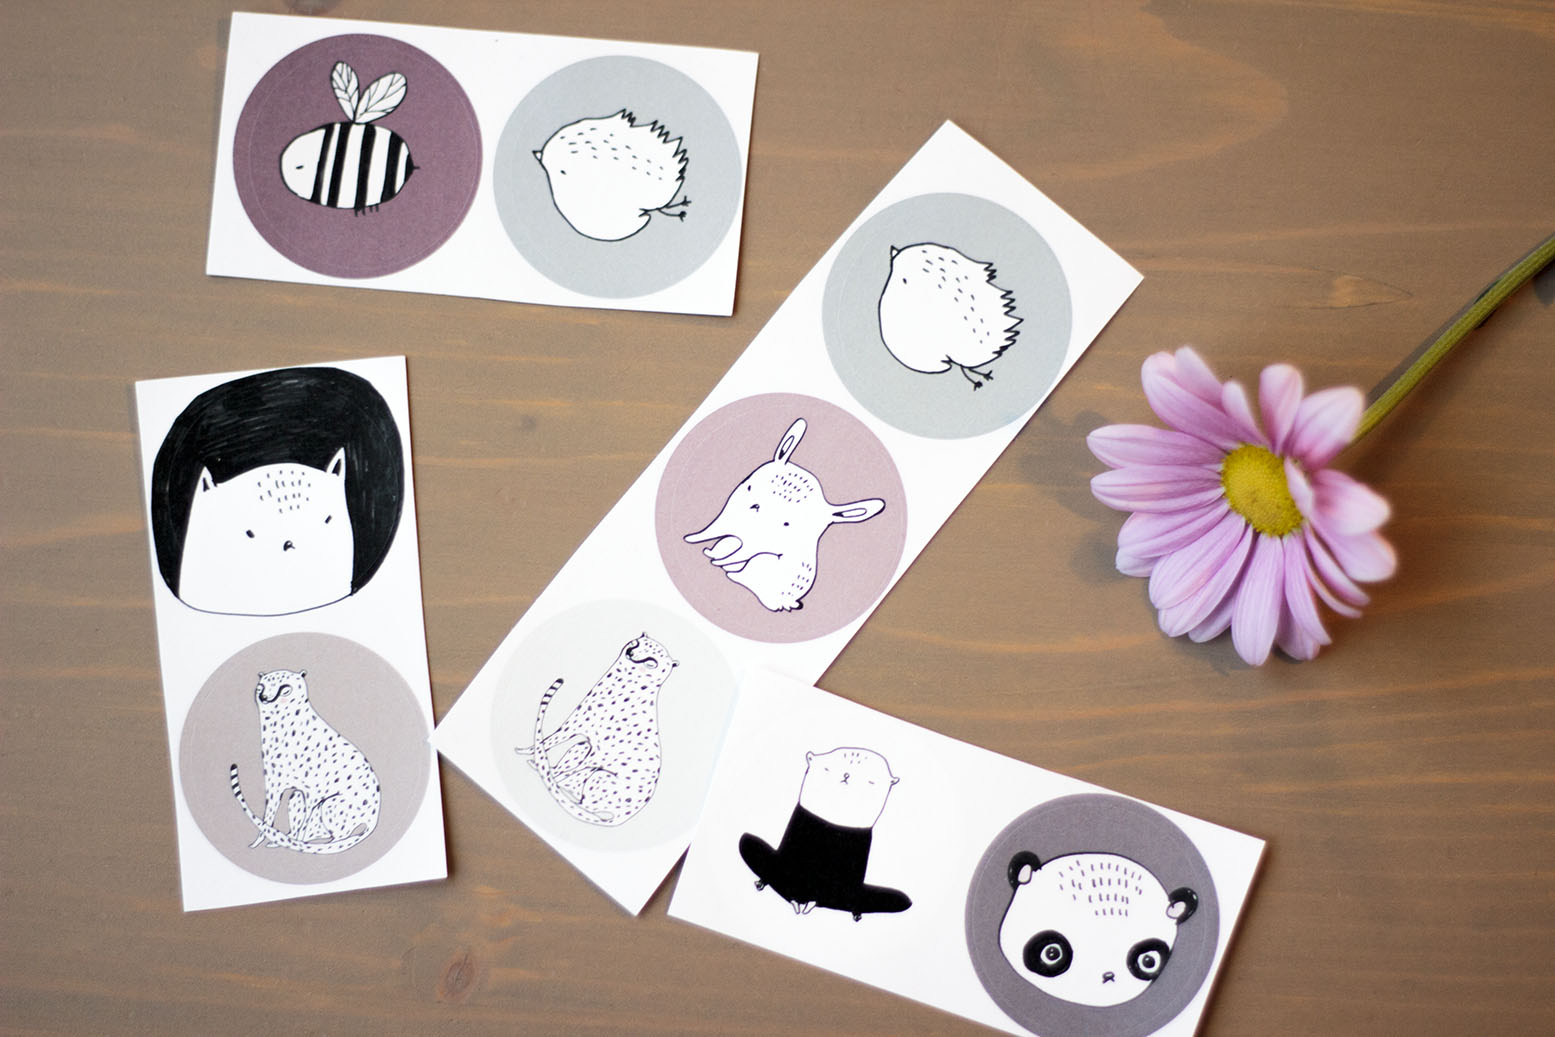 Majasbok stickers